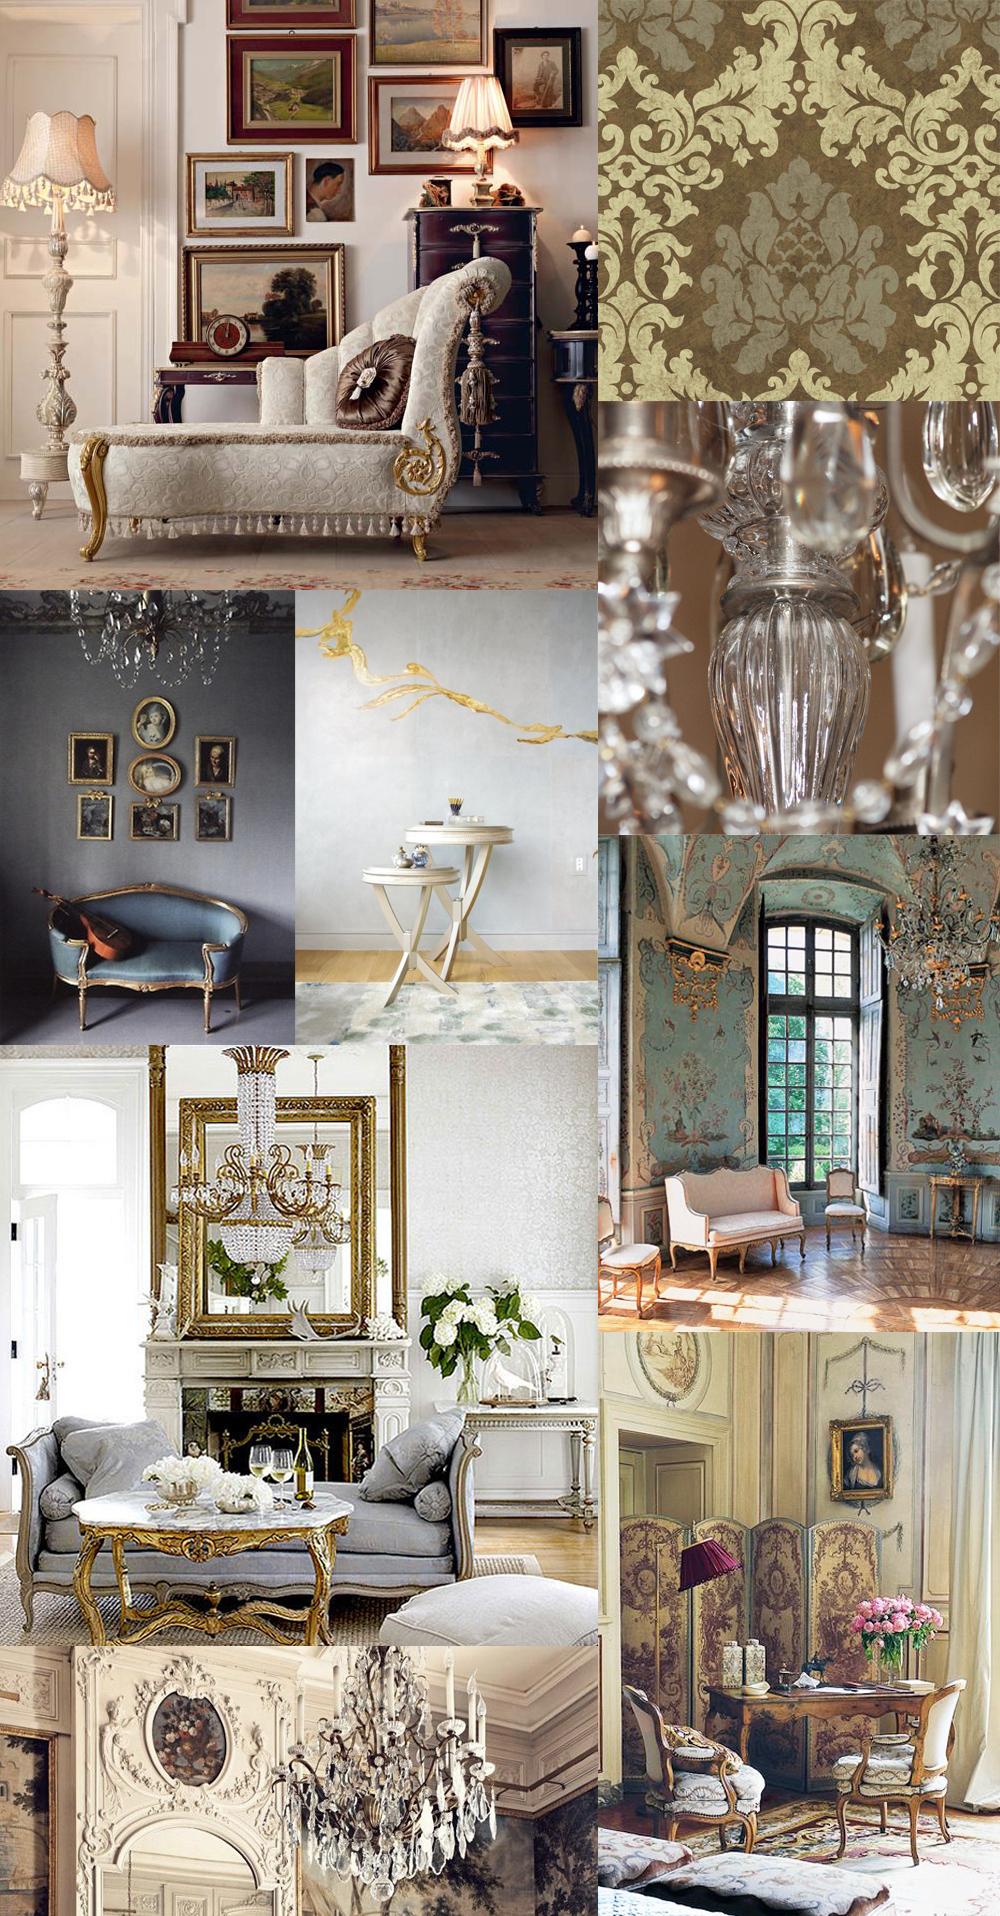 stile barocco 1 2 3 style